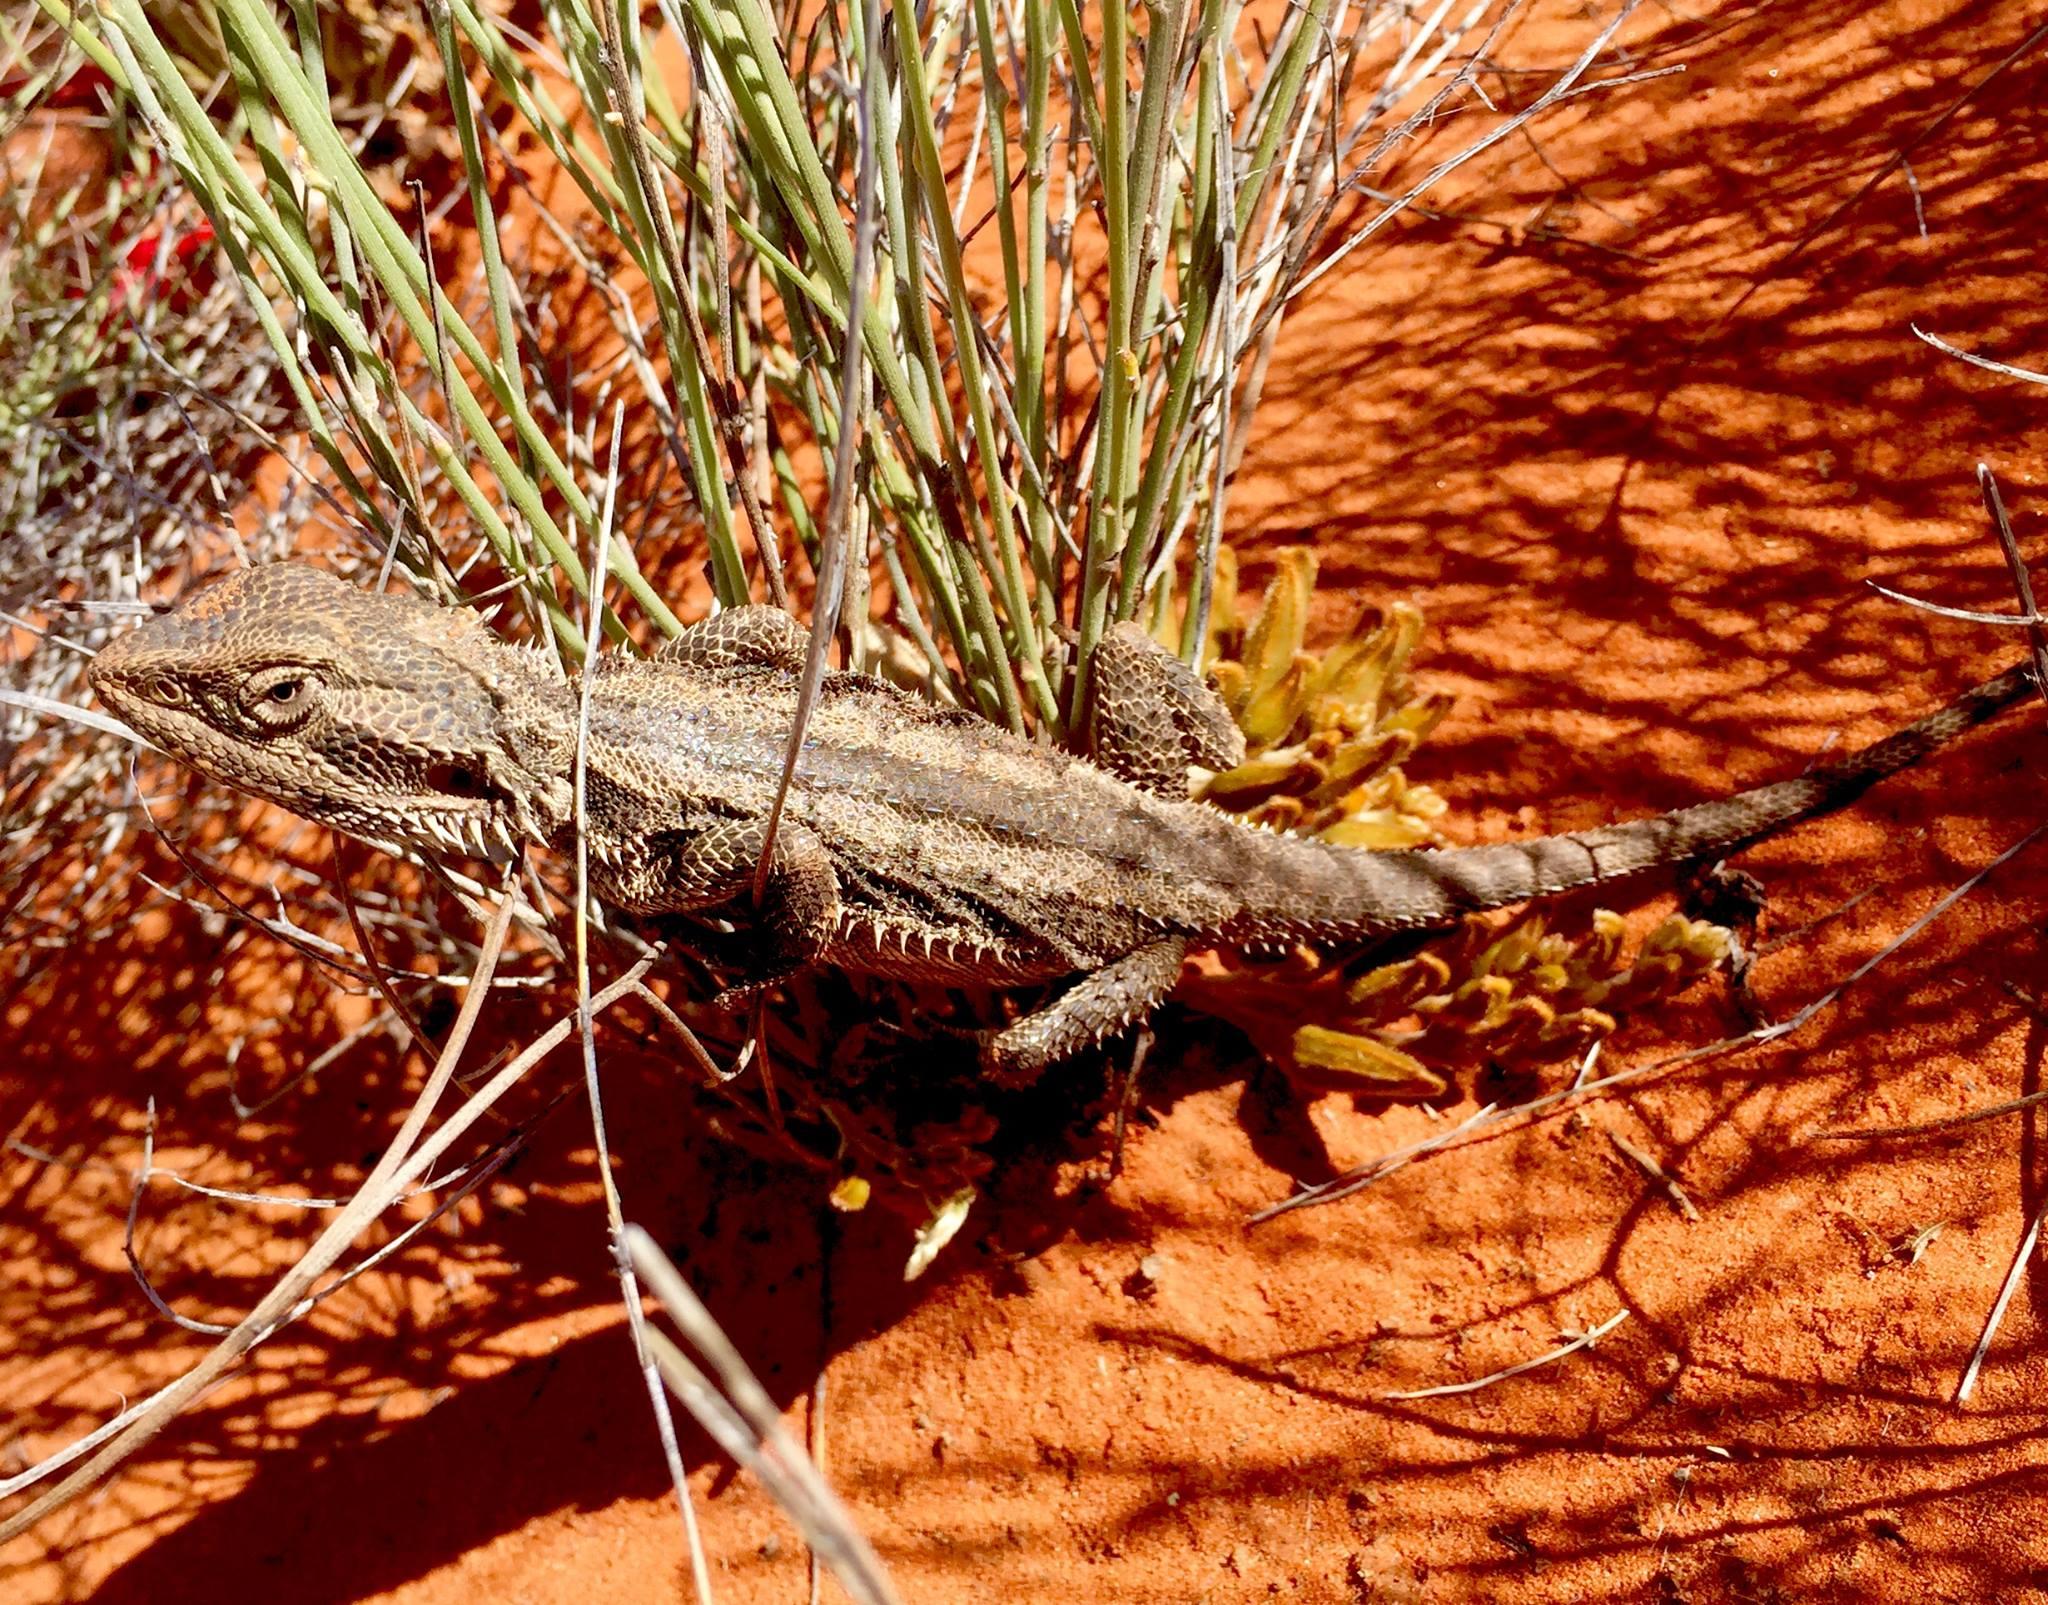 Une autre version du Lézard diable dans les territoires Aborigènes © Photo : Aboriginal Signature • Estrangin Gallery